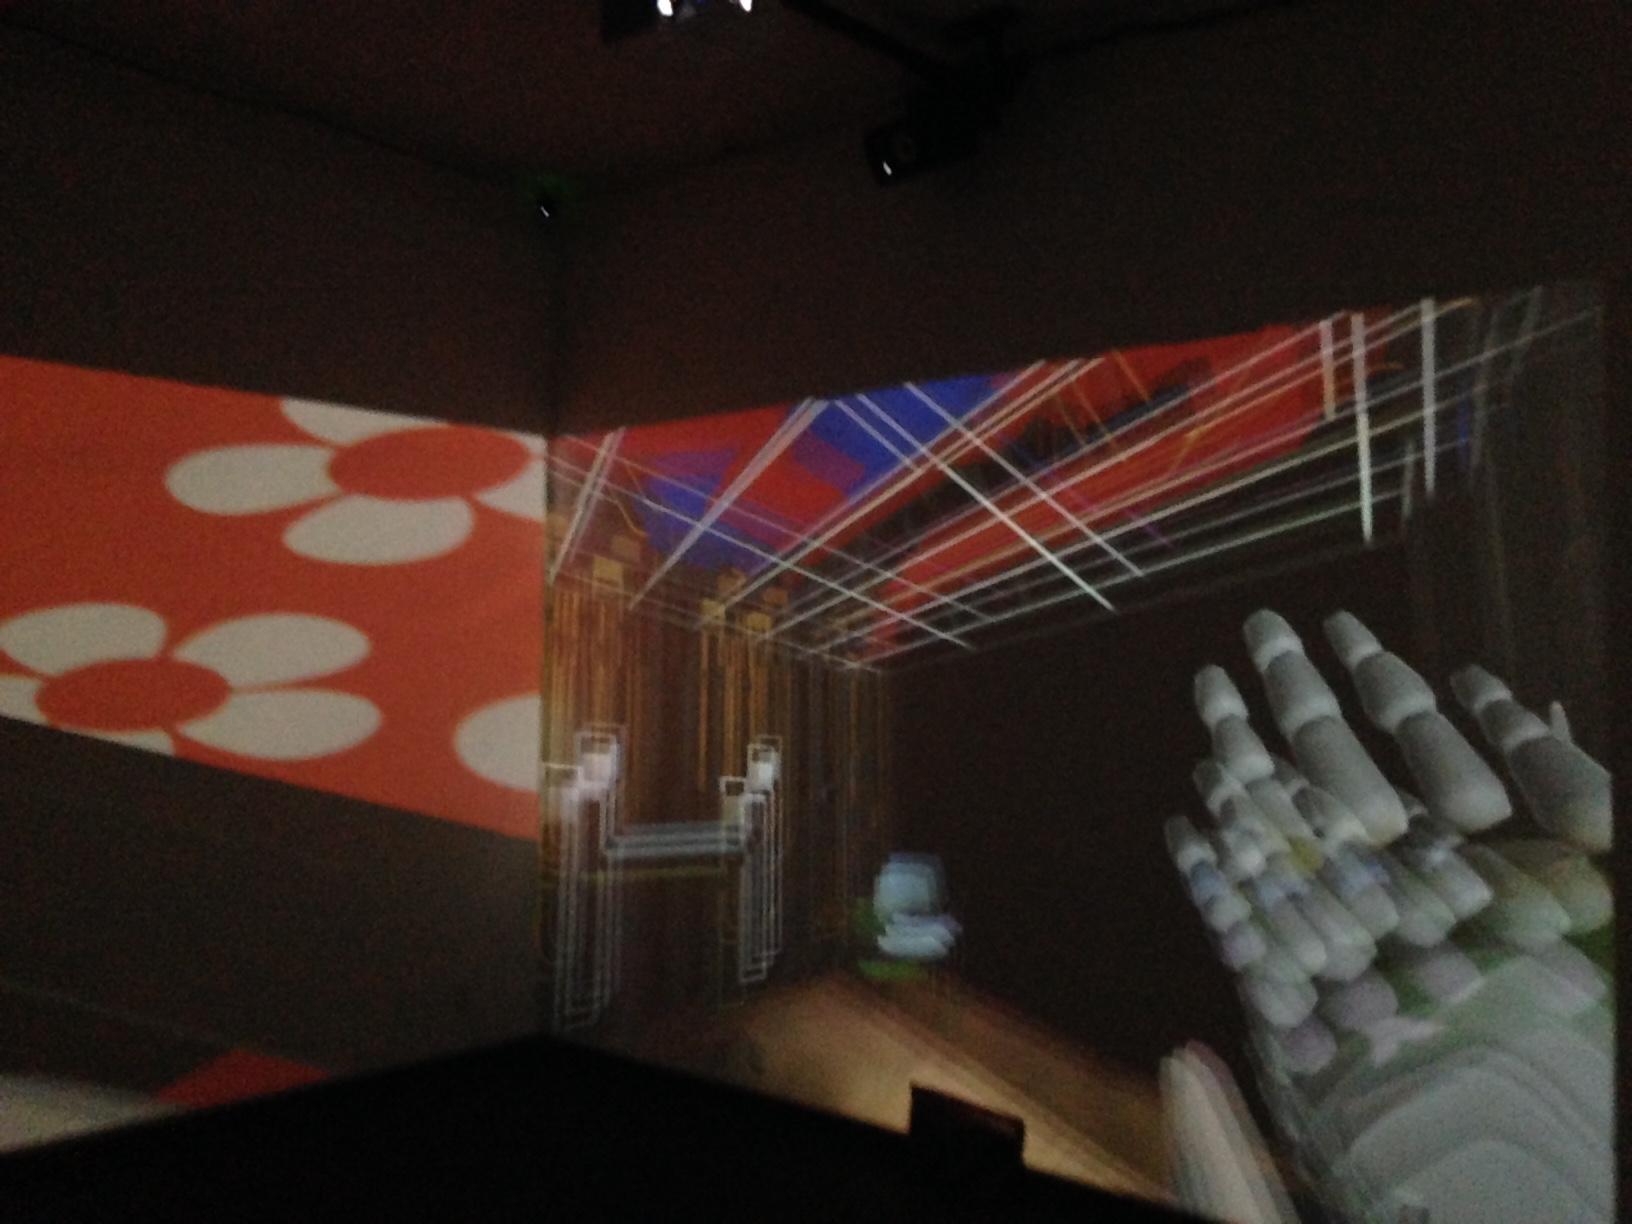 World Headquarter Tour - Viz-BIM and CAD plans to 3D models-2